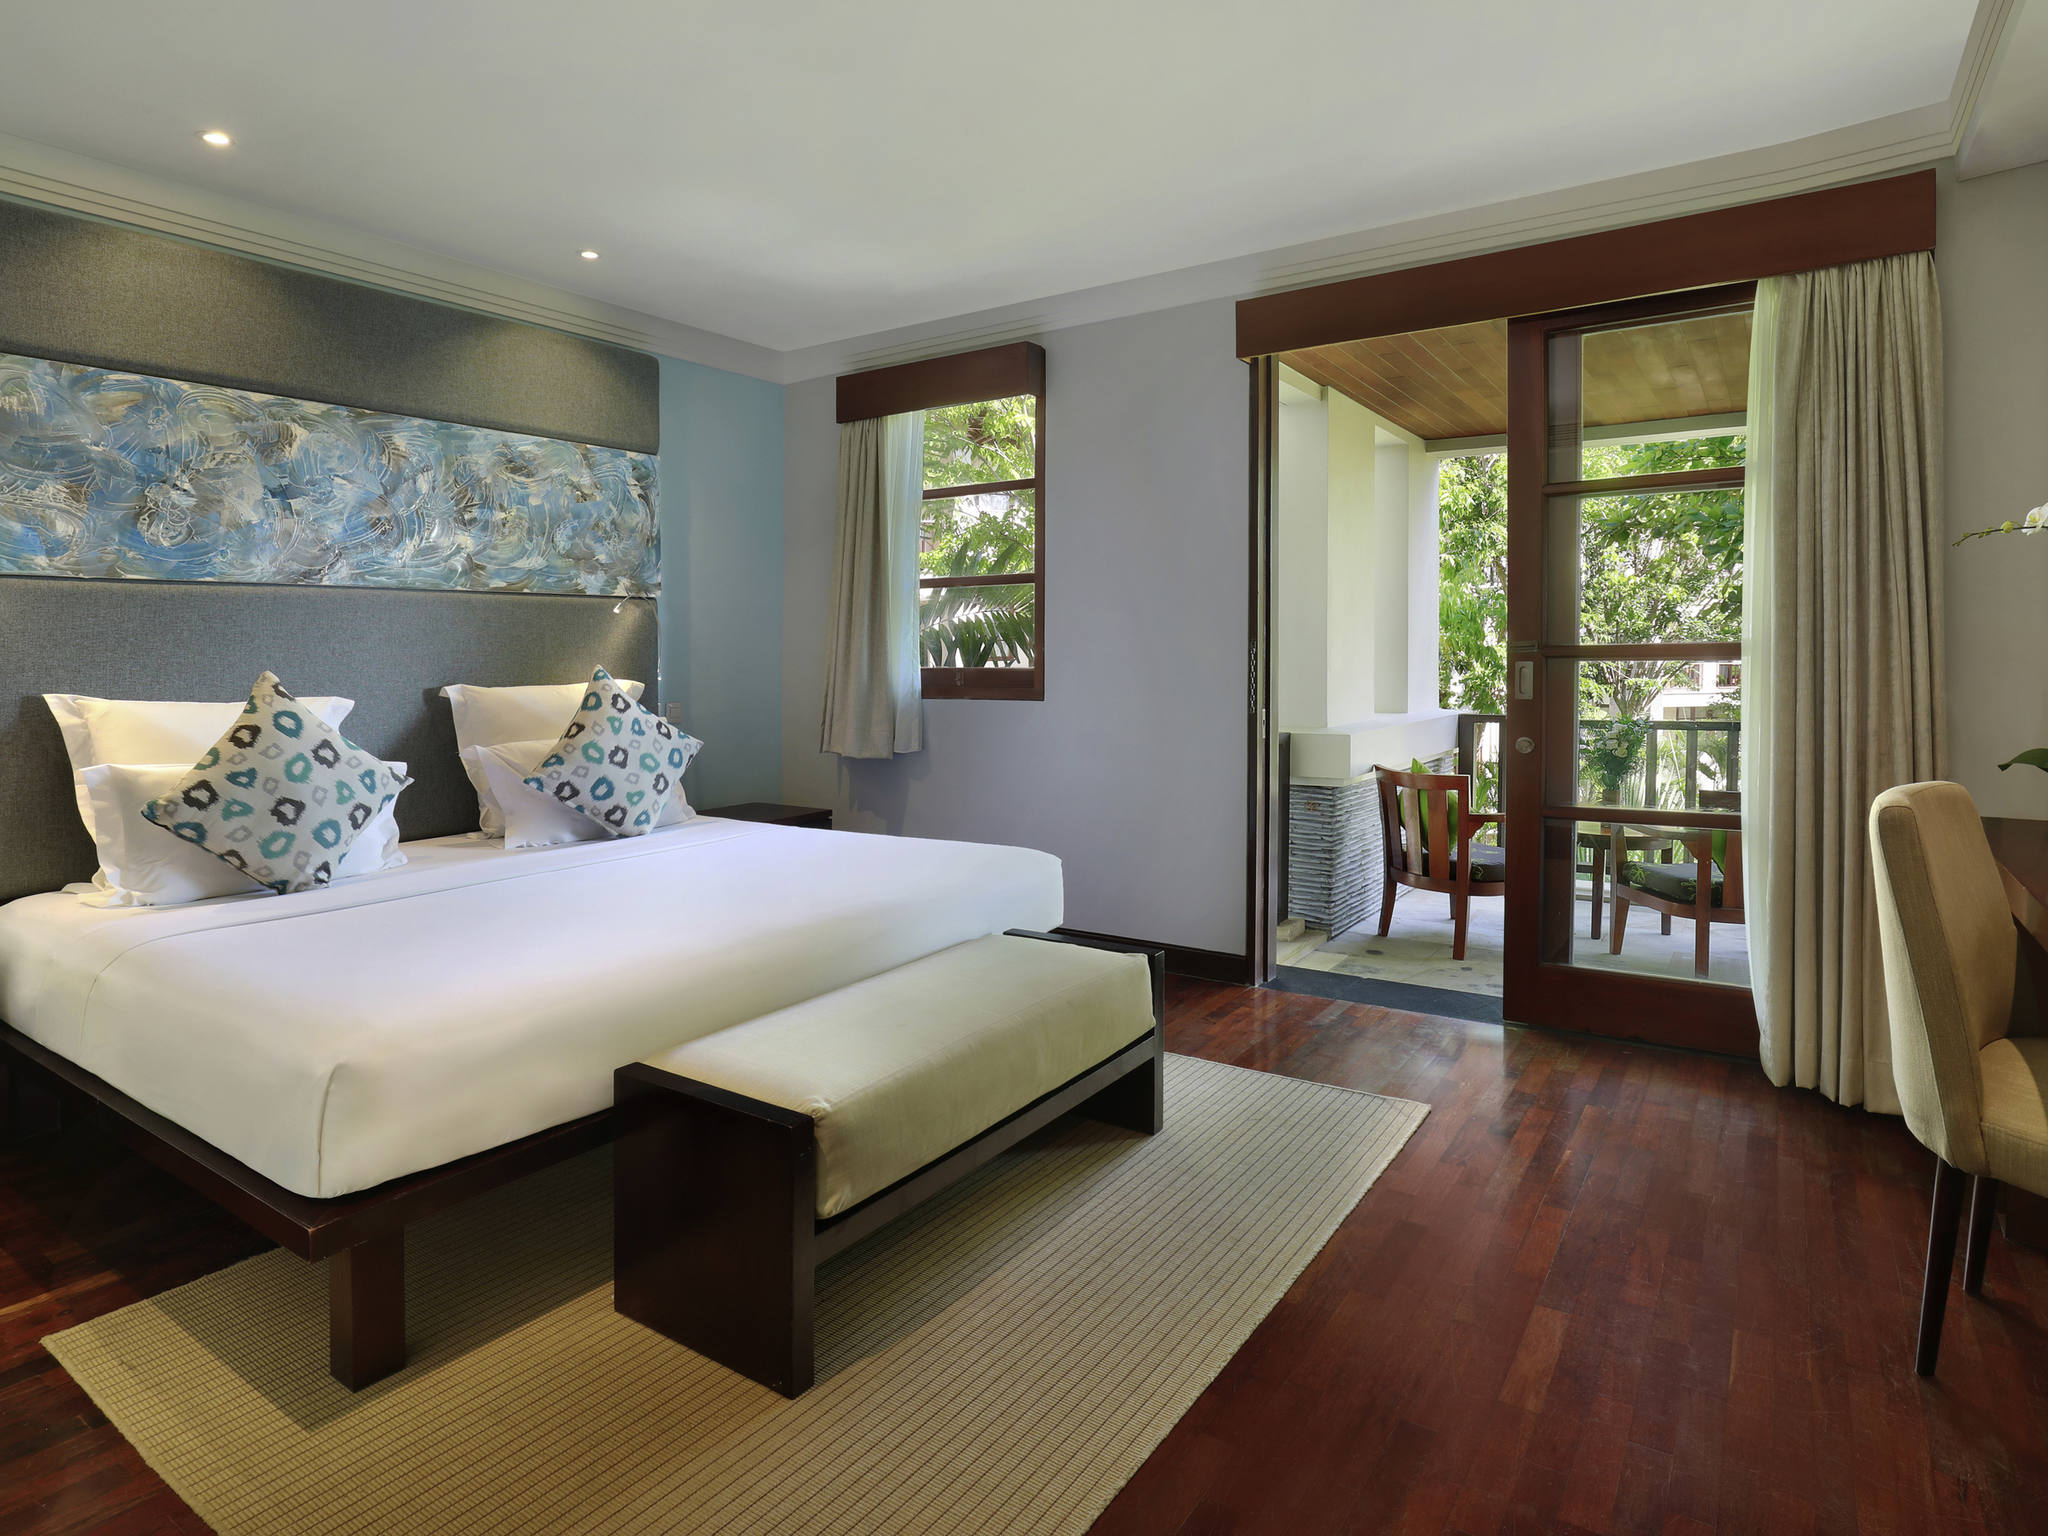 Novotel Bali Nusa Dua Hotel Residences Accorhotels Voucher Value Indonesia Rooms